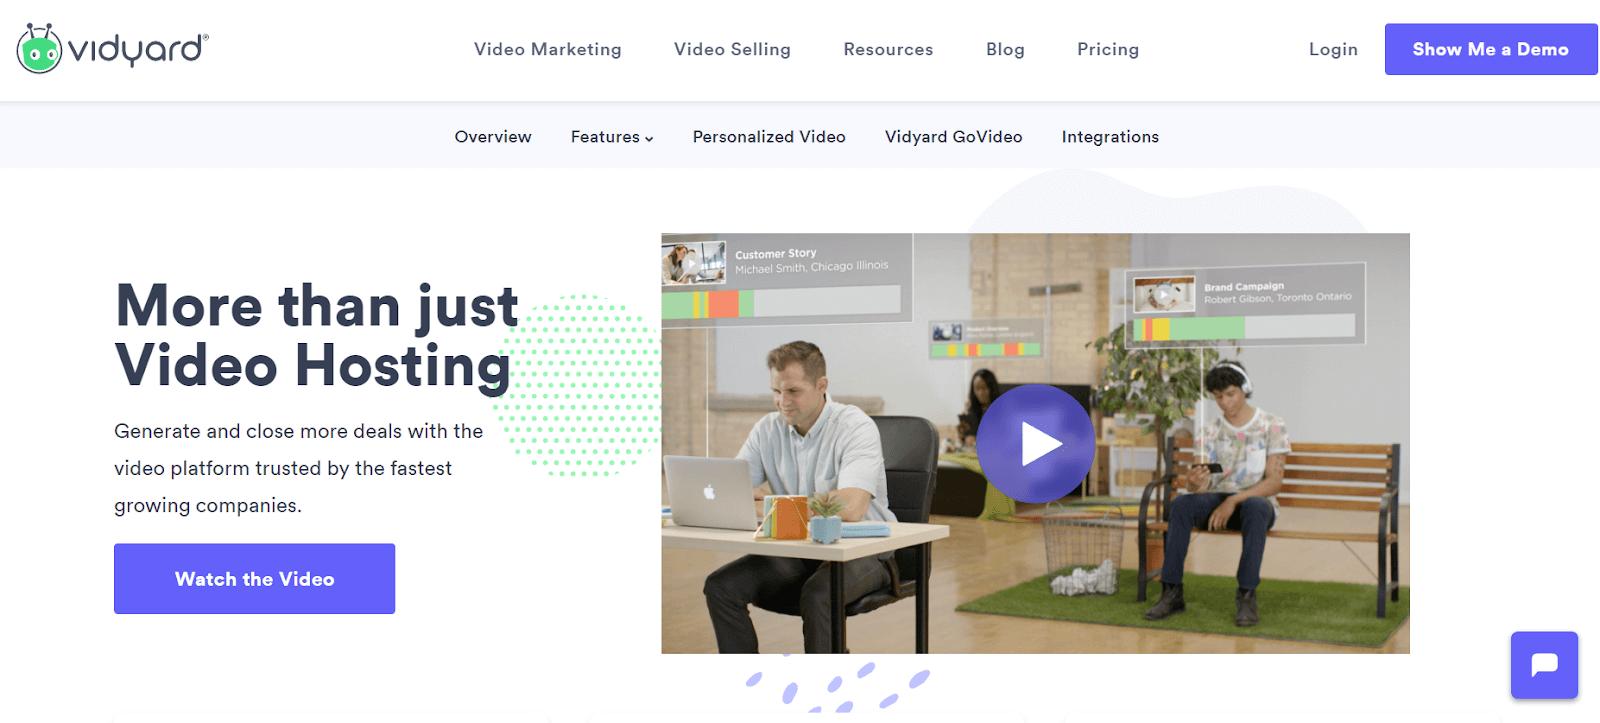 Vidyard Video Marketing Tool